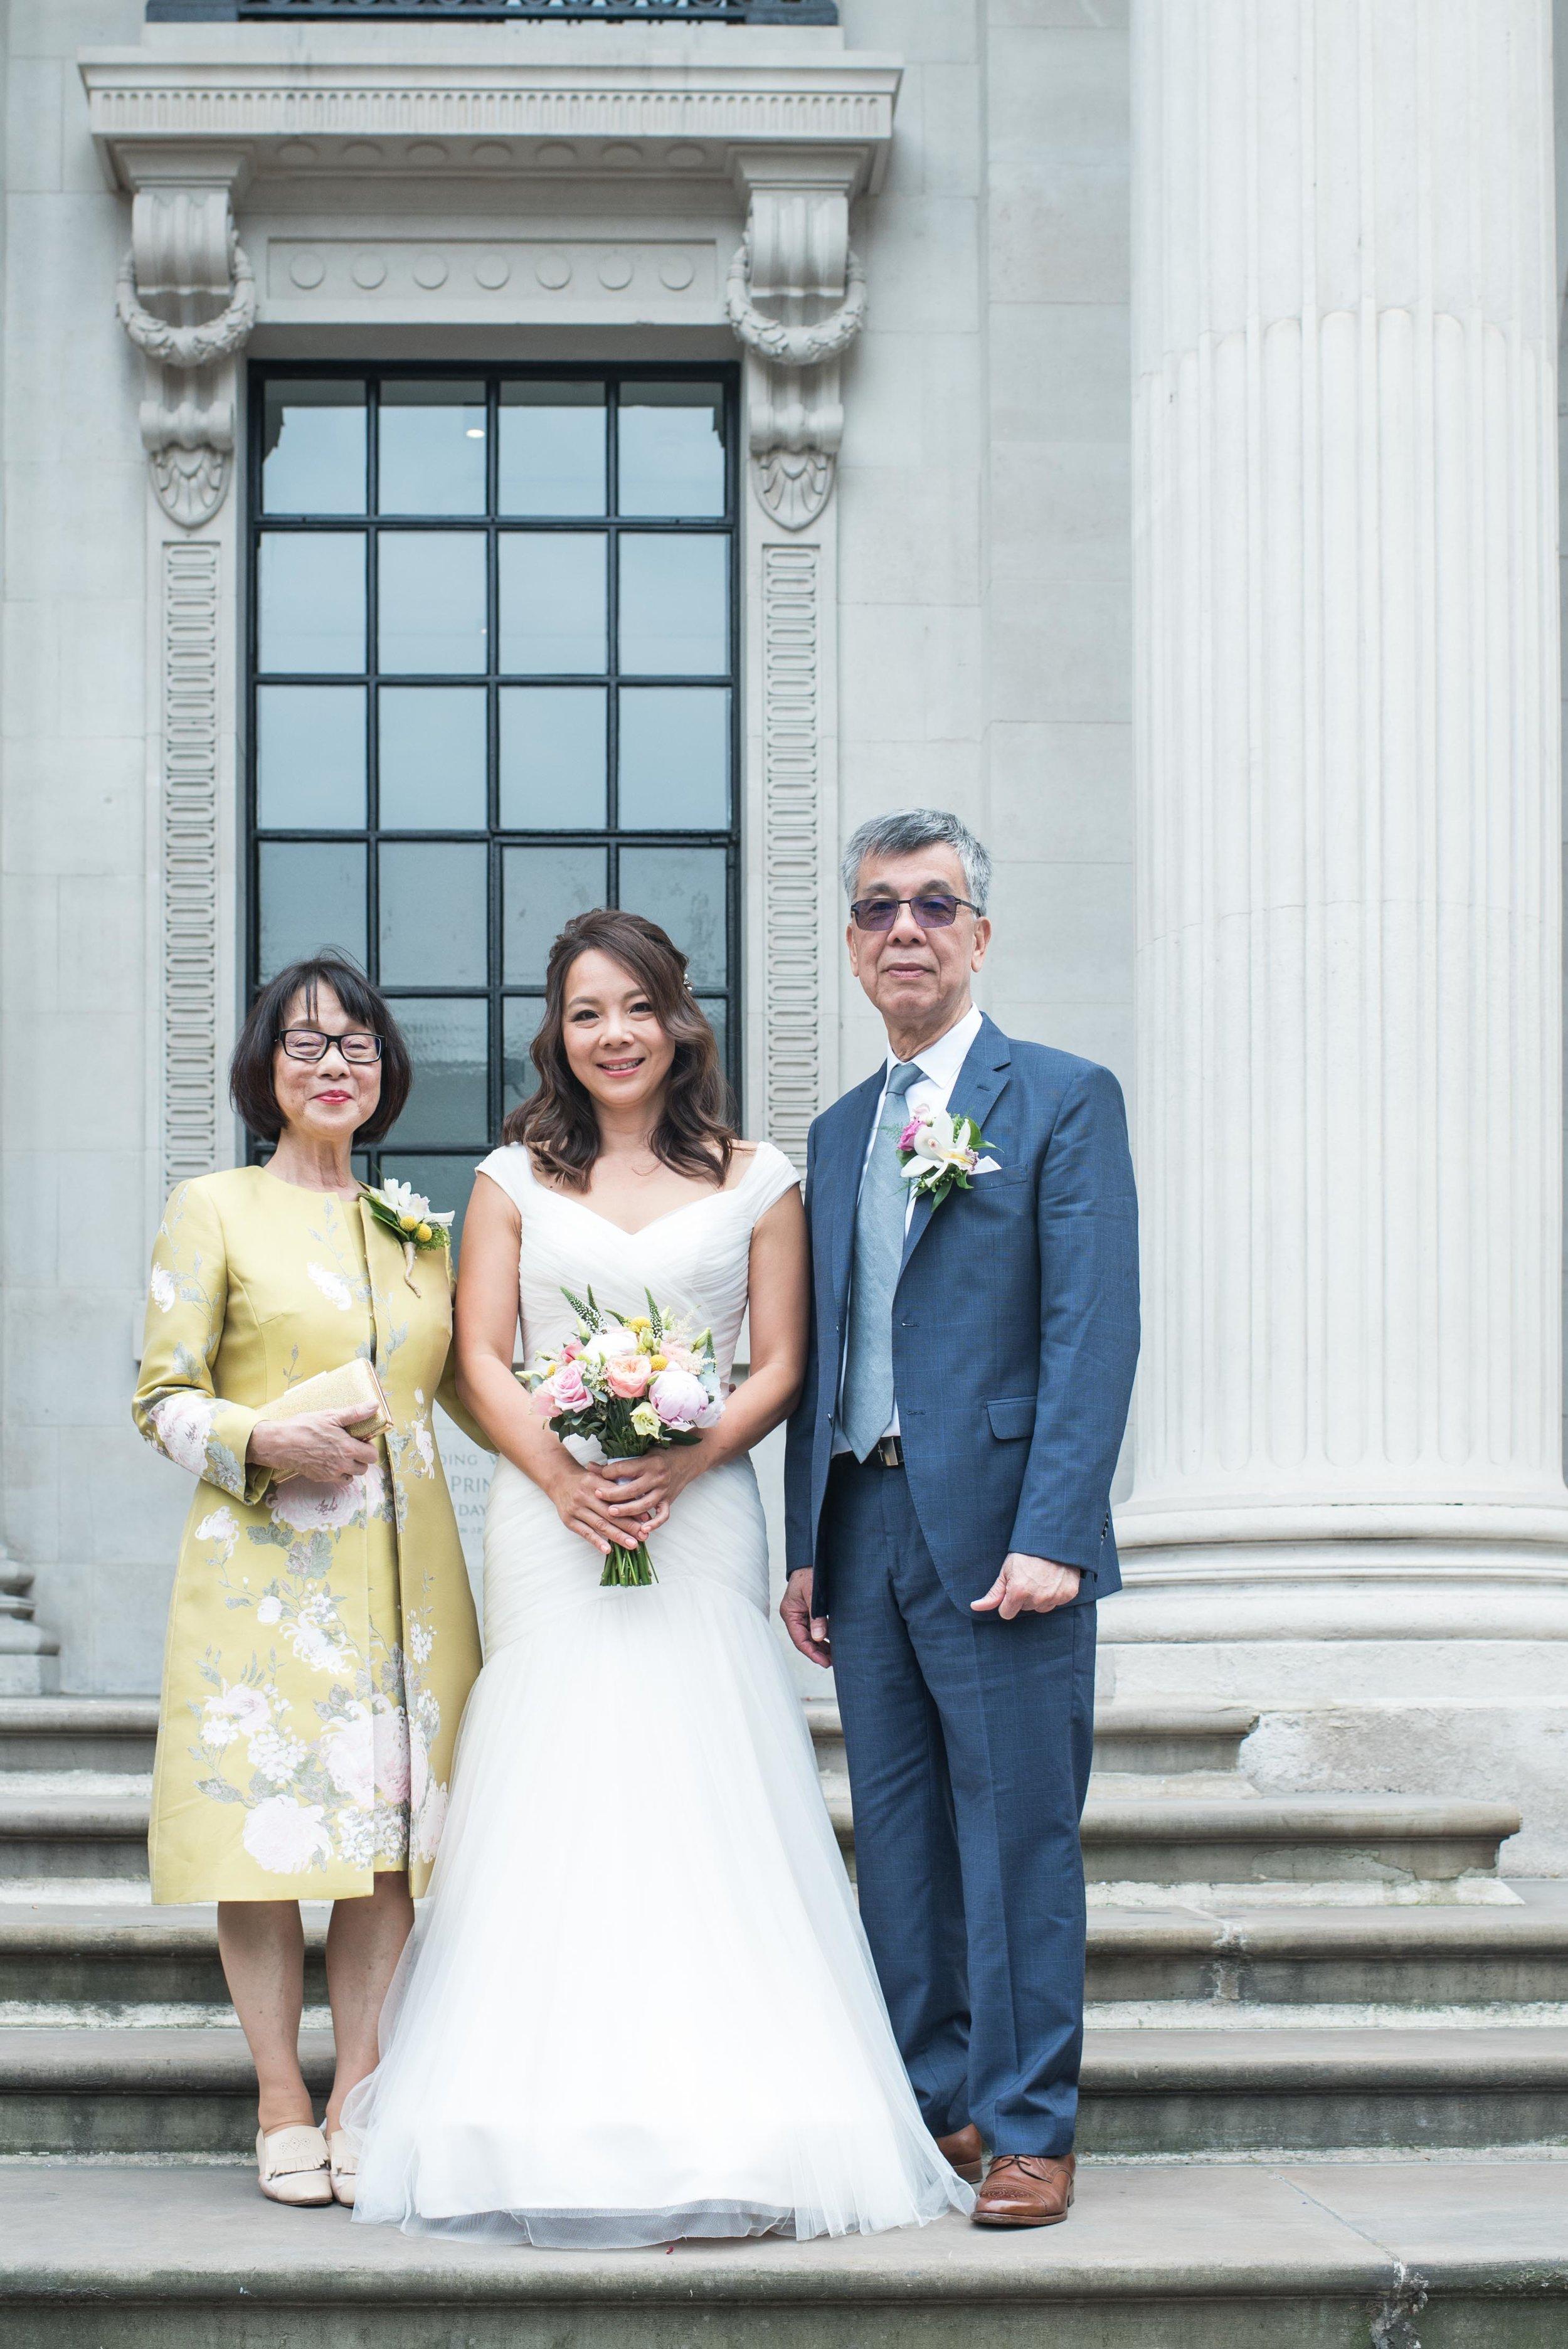 D&M_Marylebone Town Hall Wedding (59 of 239).jpg